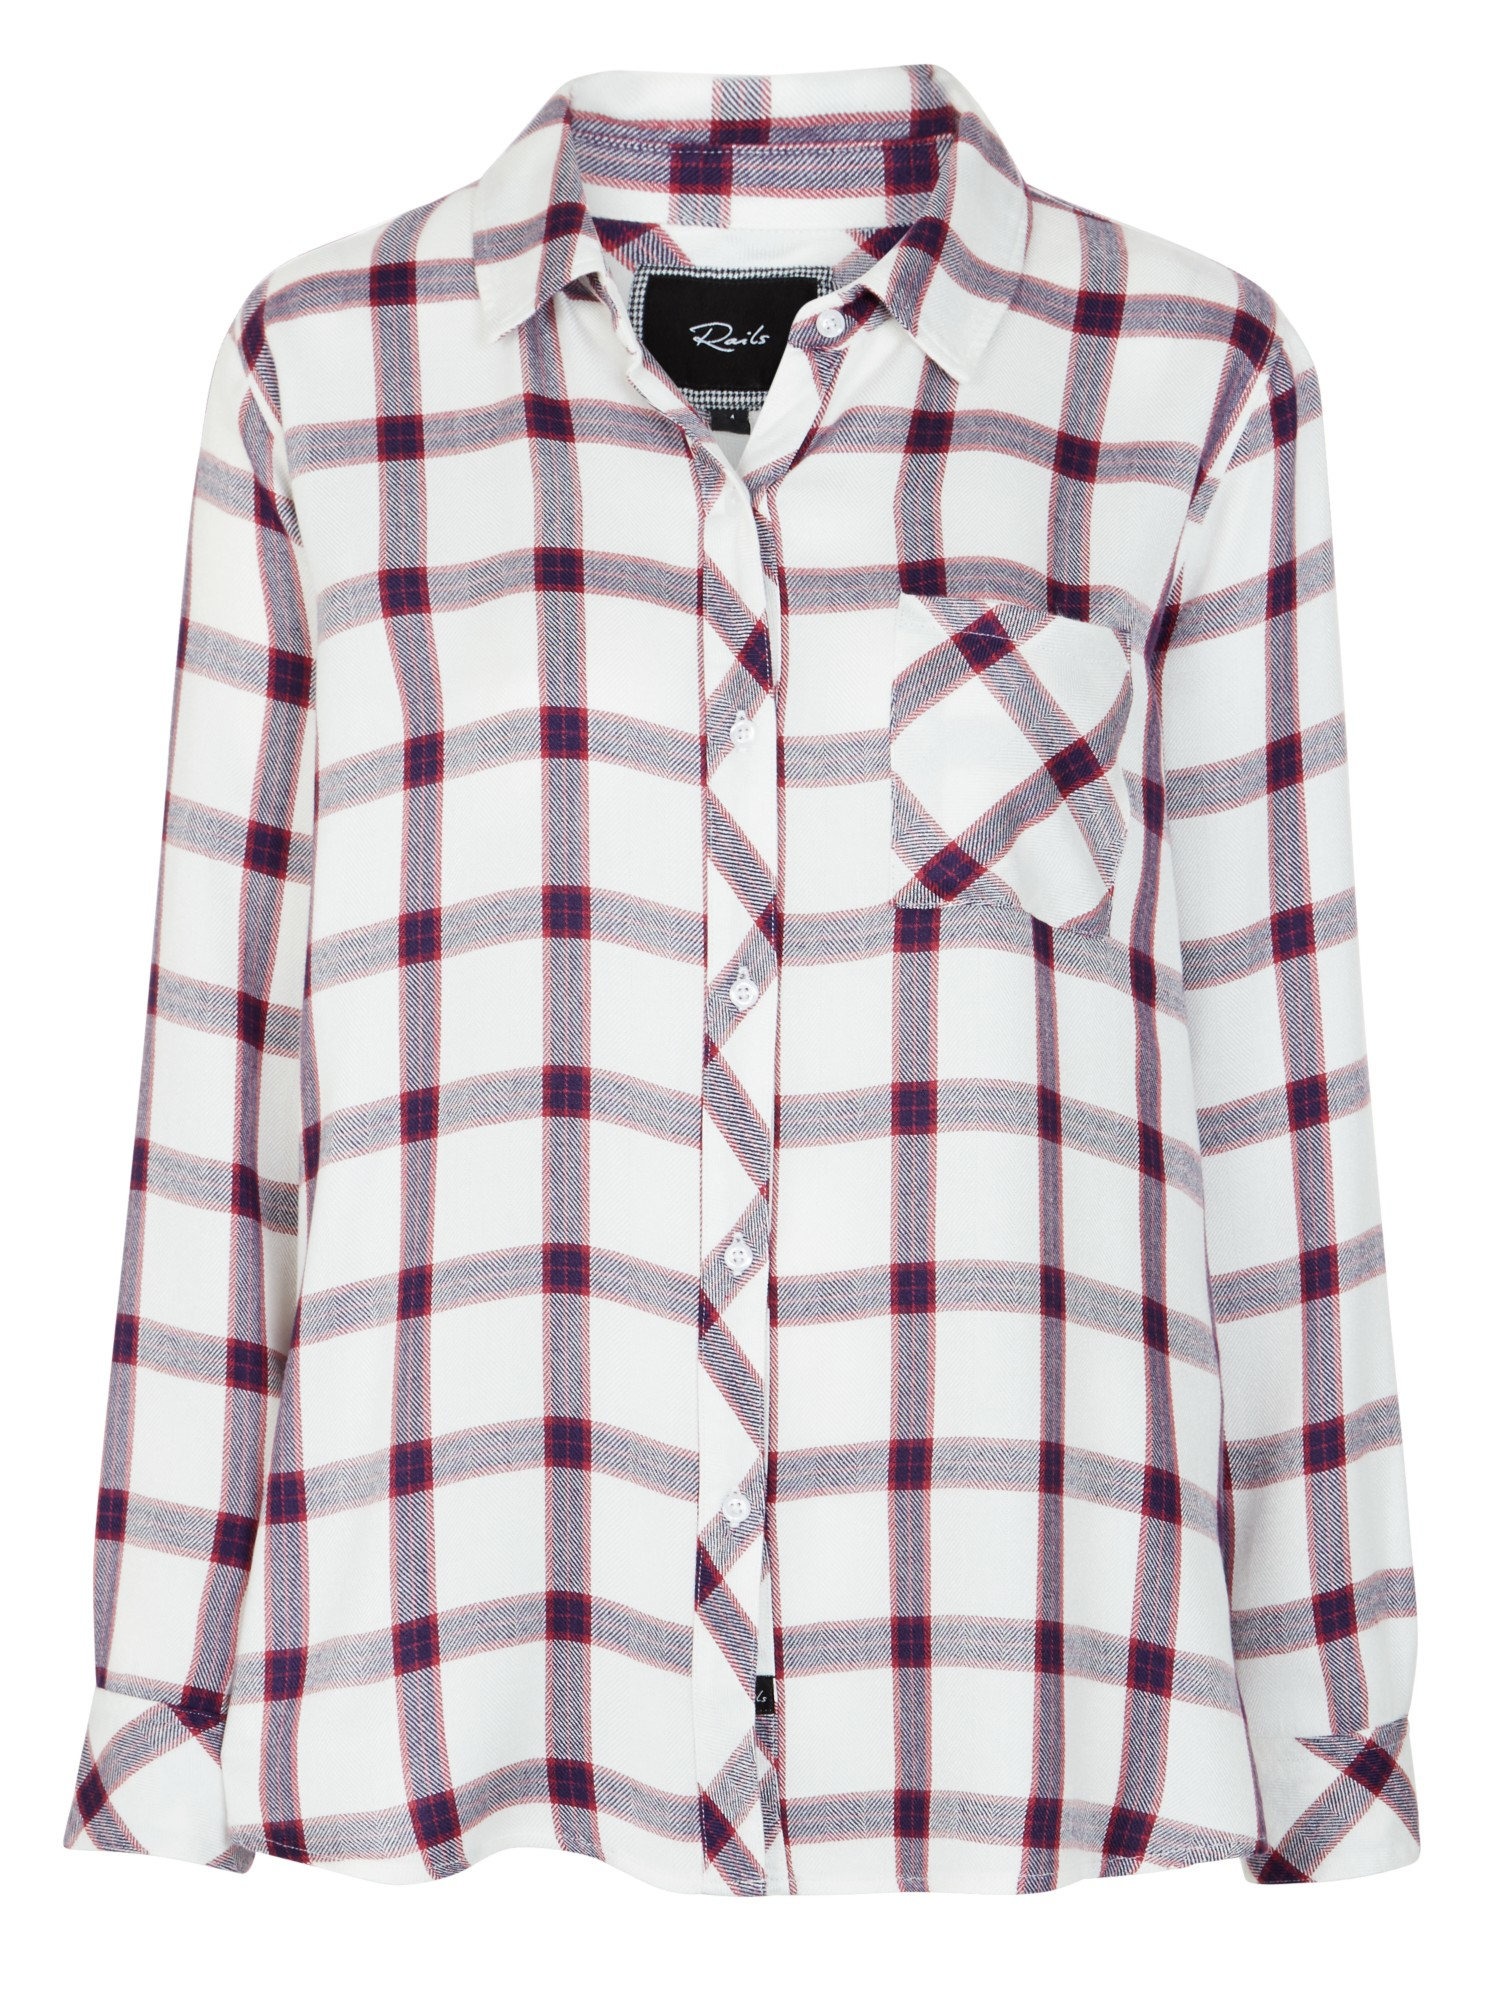 Rails Denim Hunter Plaid Shirt in Cream/Rose (White)